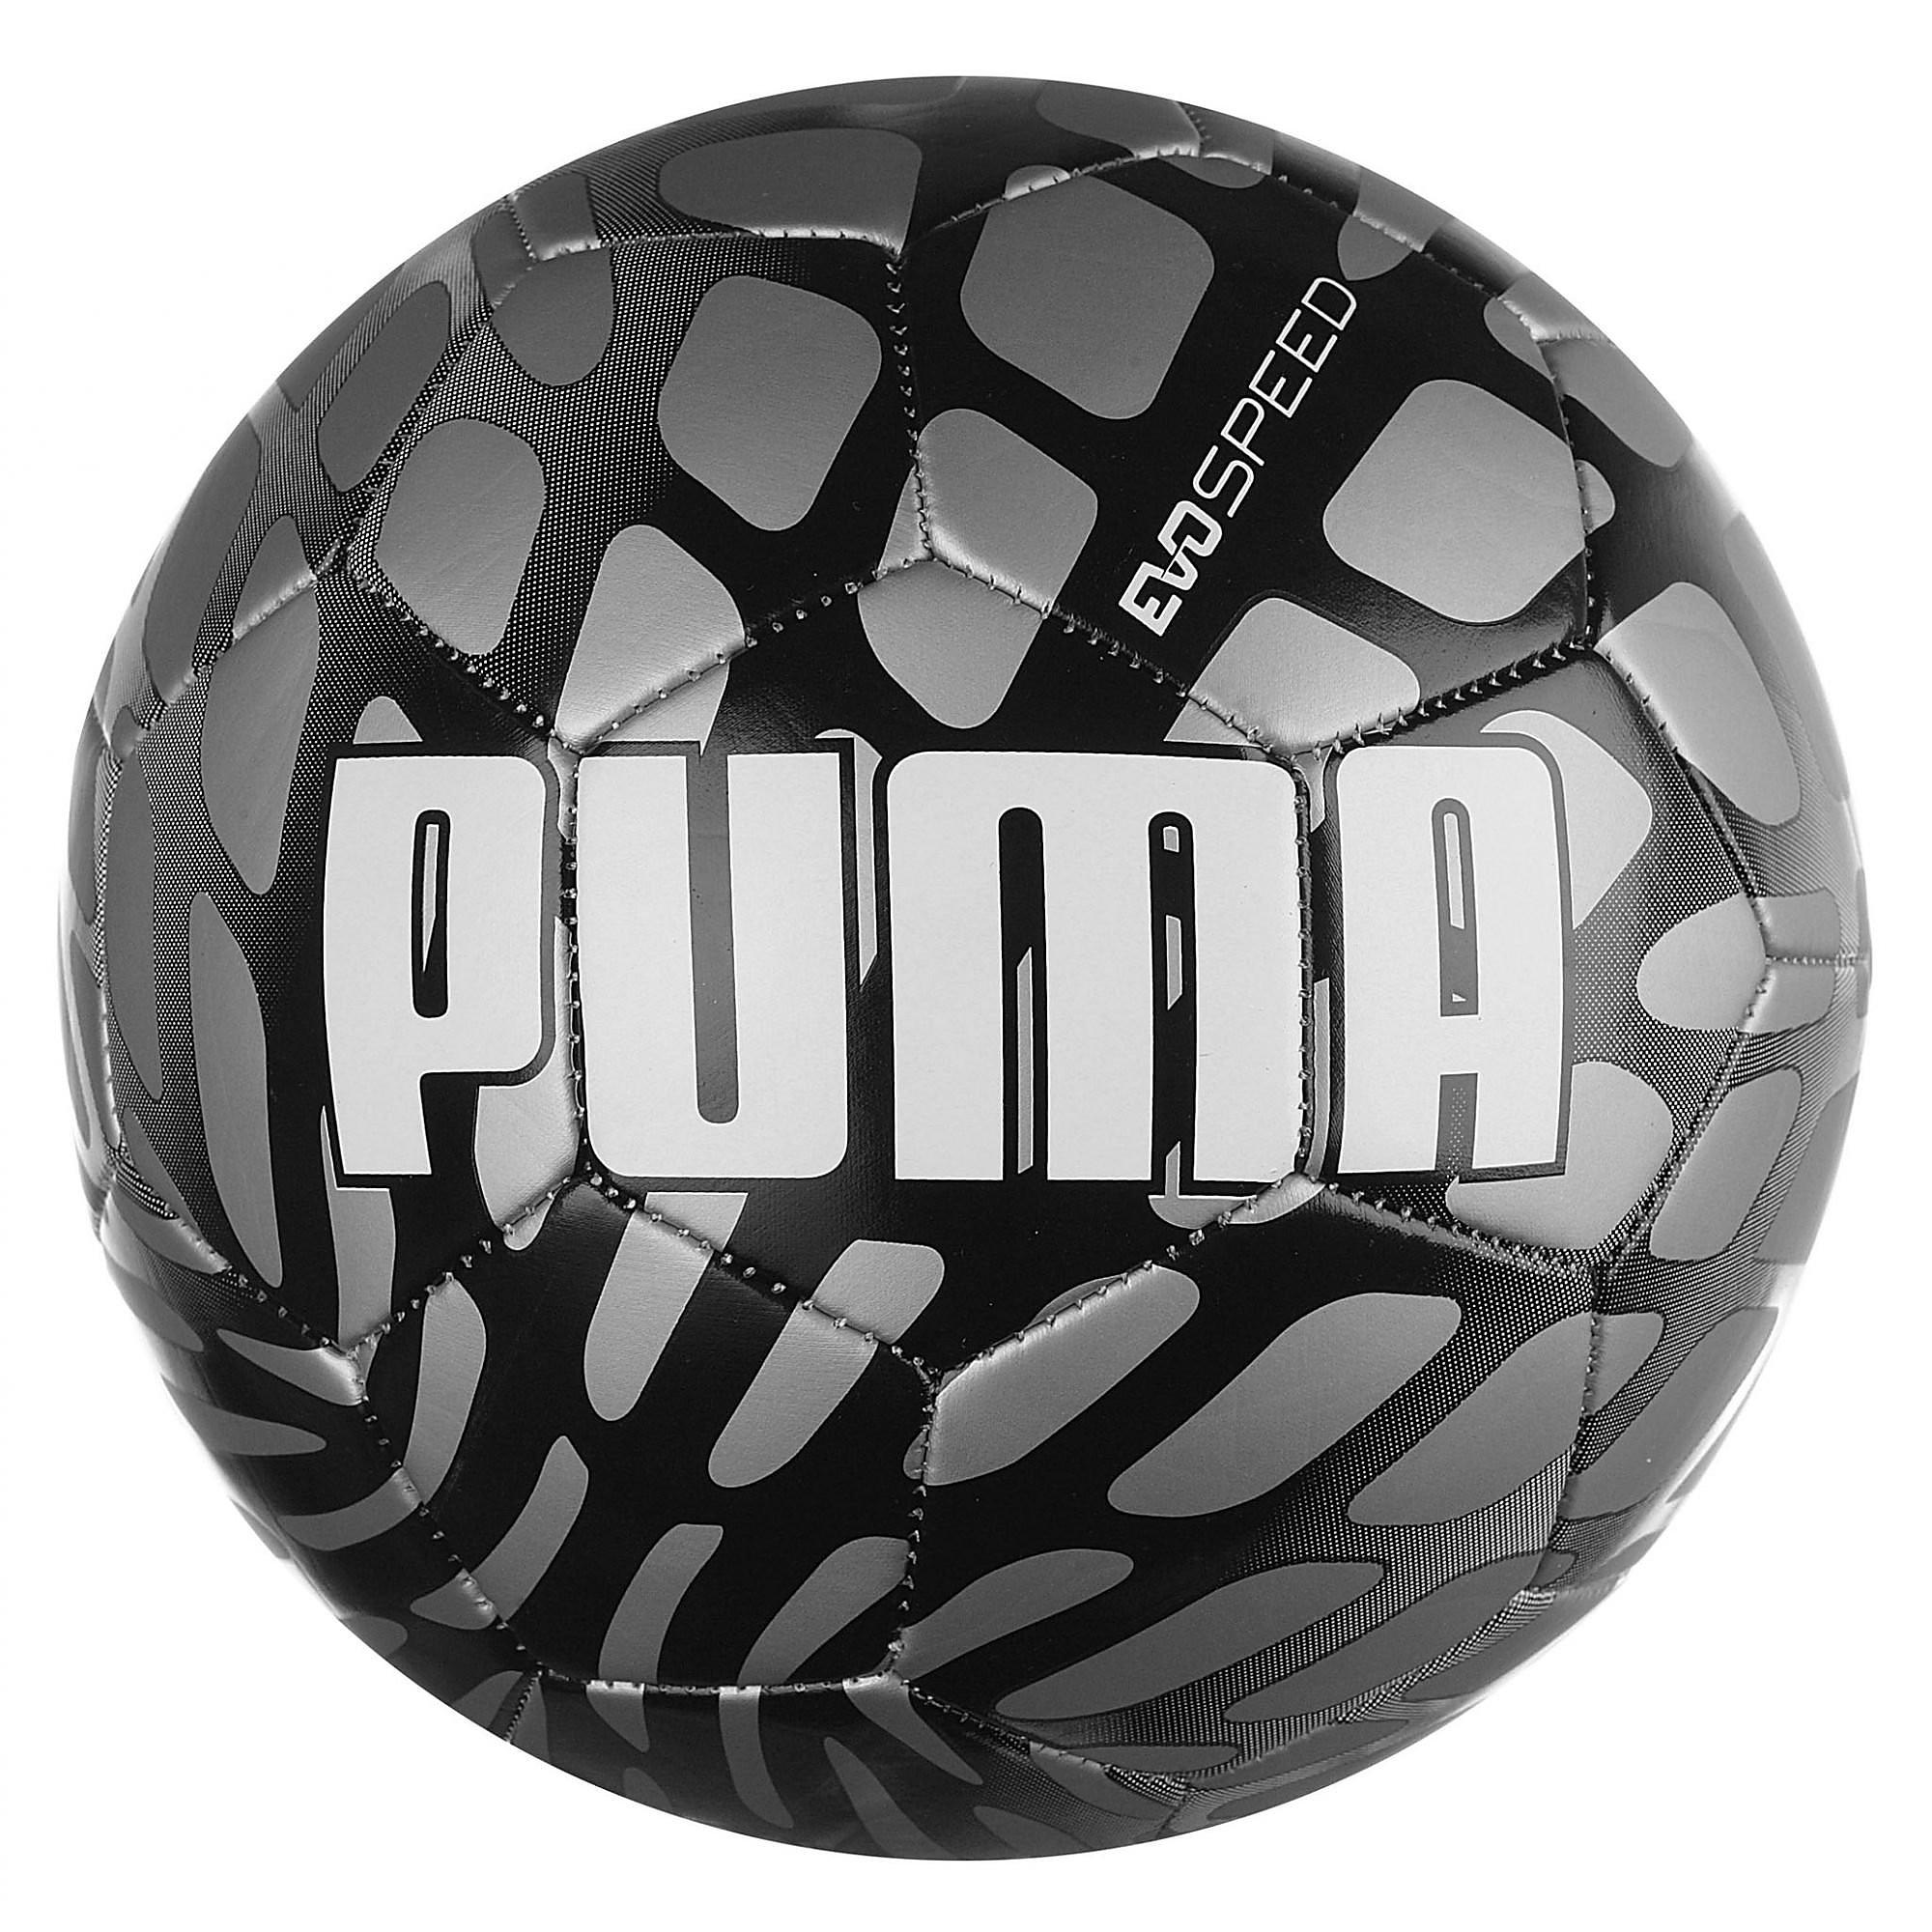 PUMA EVOSPEED 5.4 GRAPHIC